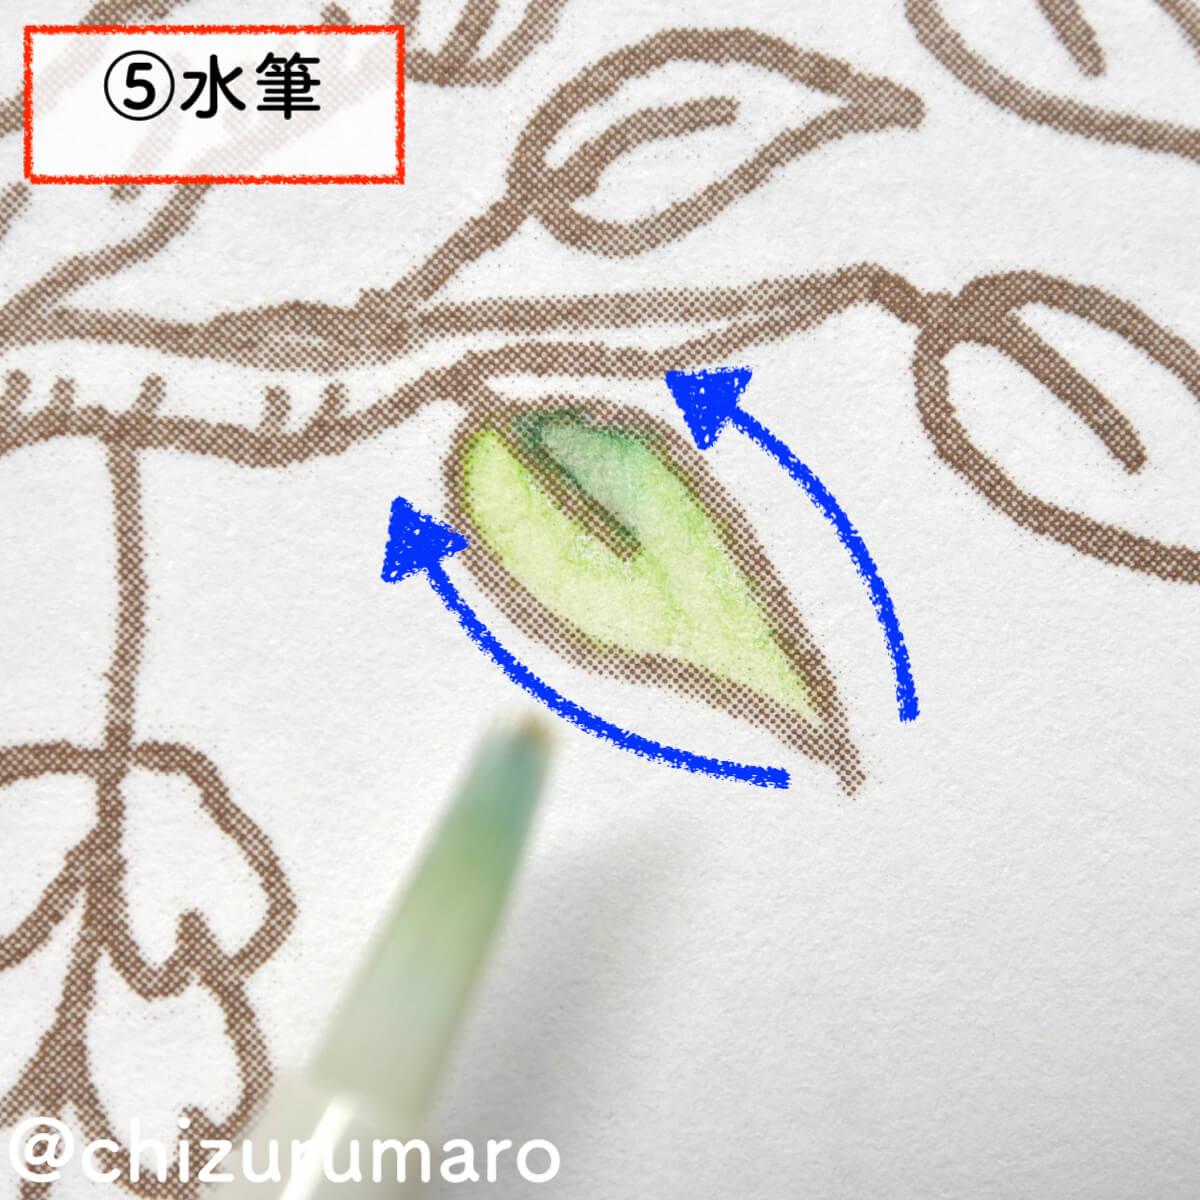 f:id:chizurumaro:20201105213011j:plain